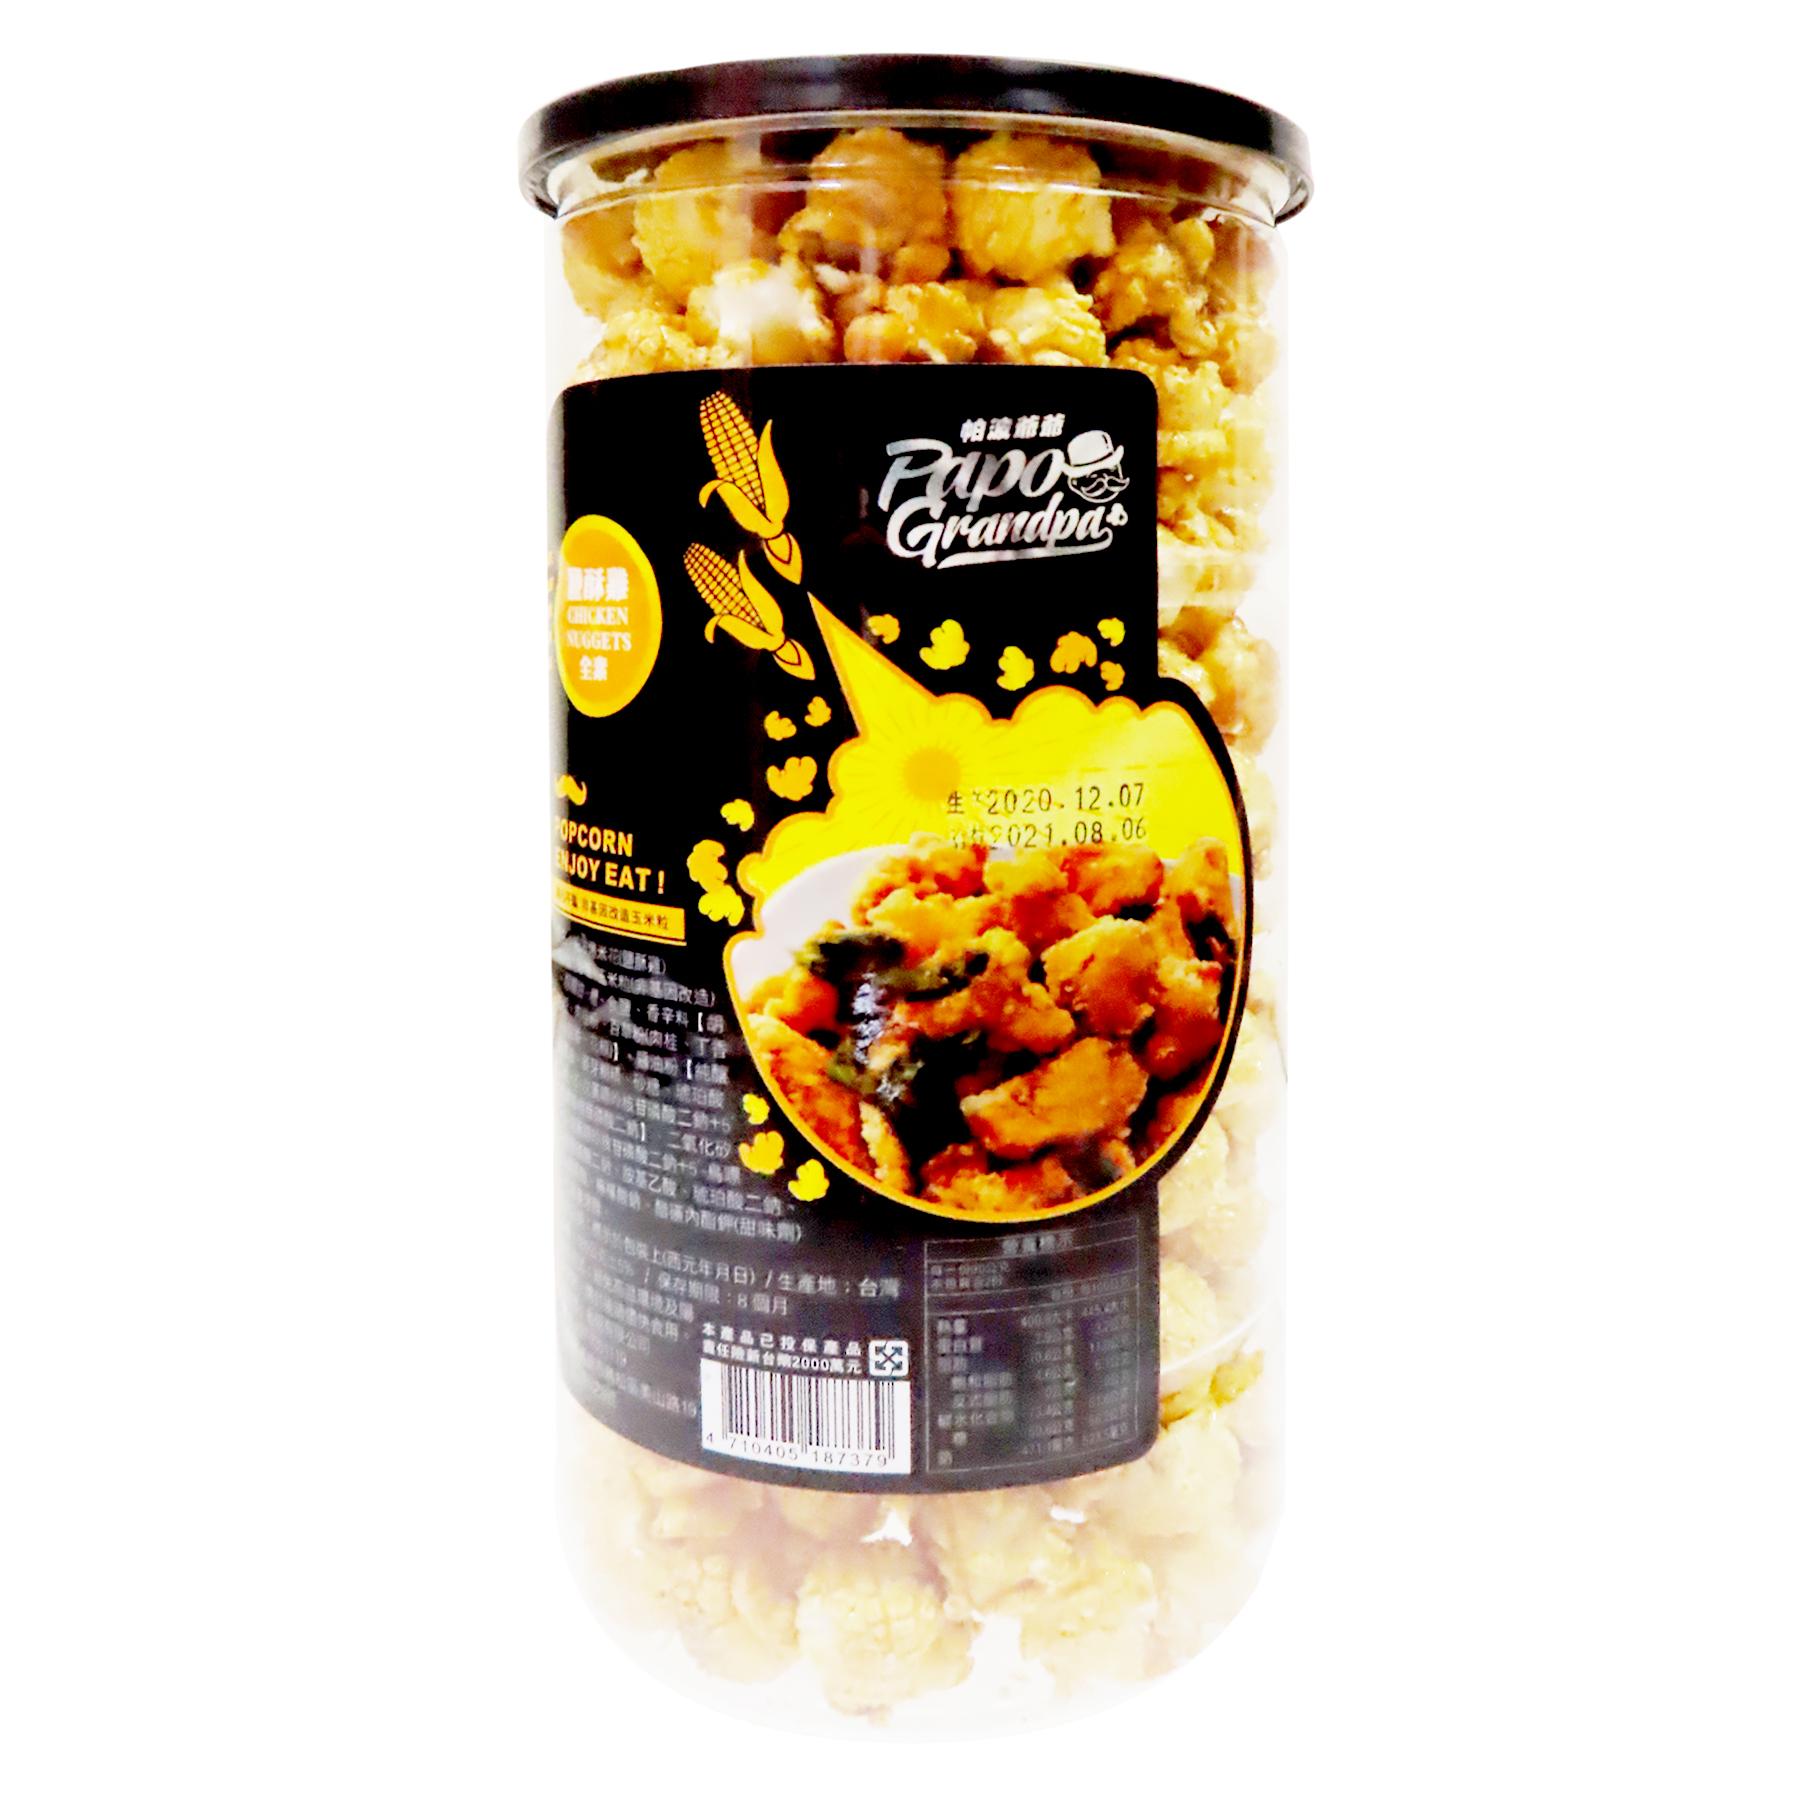 Image Papo Popcorn Vegan Chicken Nugget 金砚-鹽酥雞爆米花 180grams